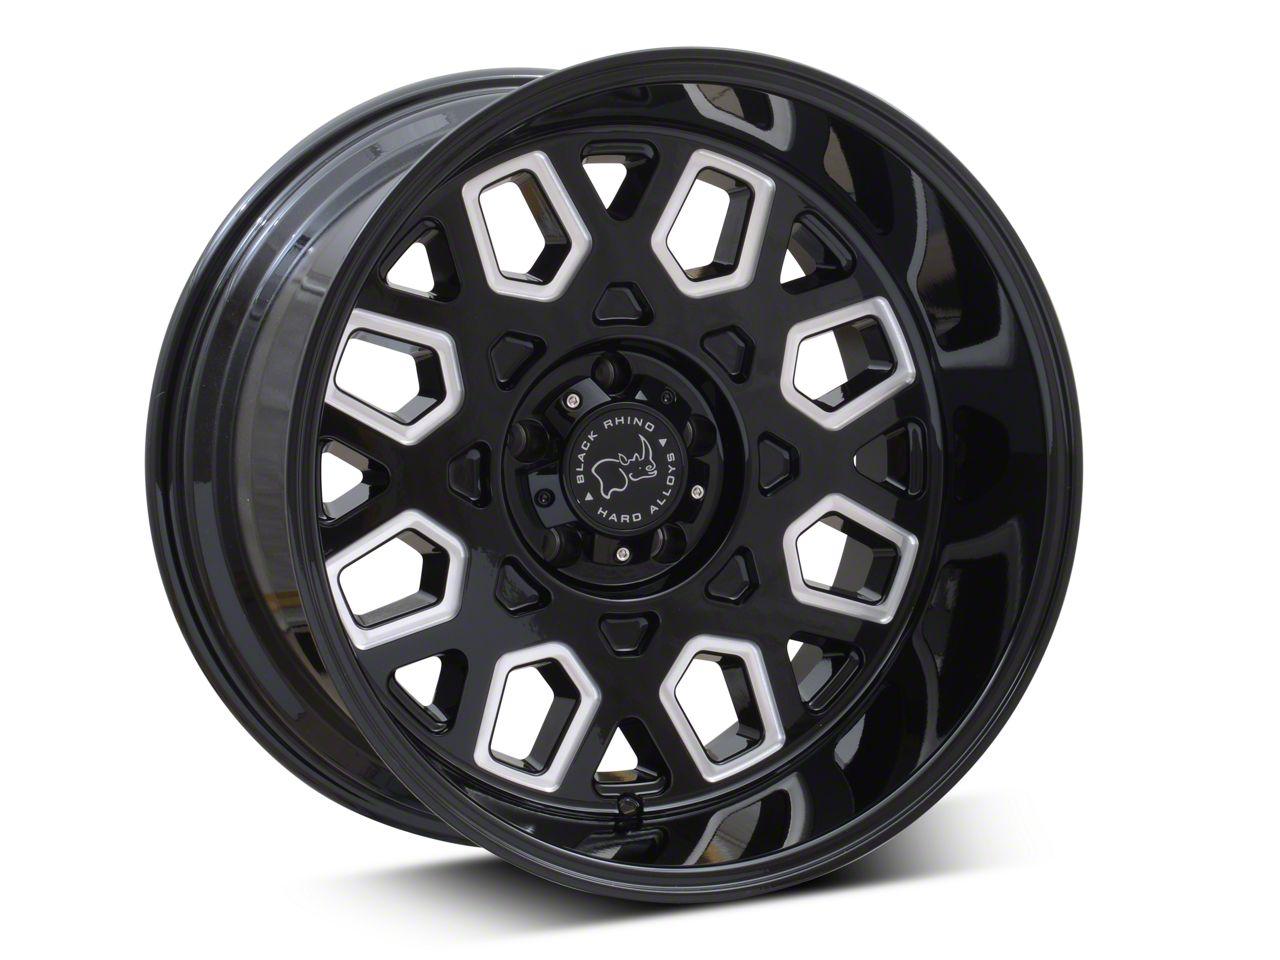 Black Rhino Predator Gloss Black Wheels (07-18 Jeep Wrangler JK; 2018 Jeep Wrangler JL)